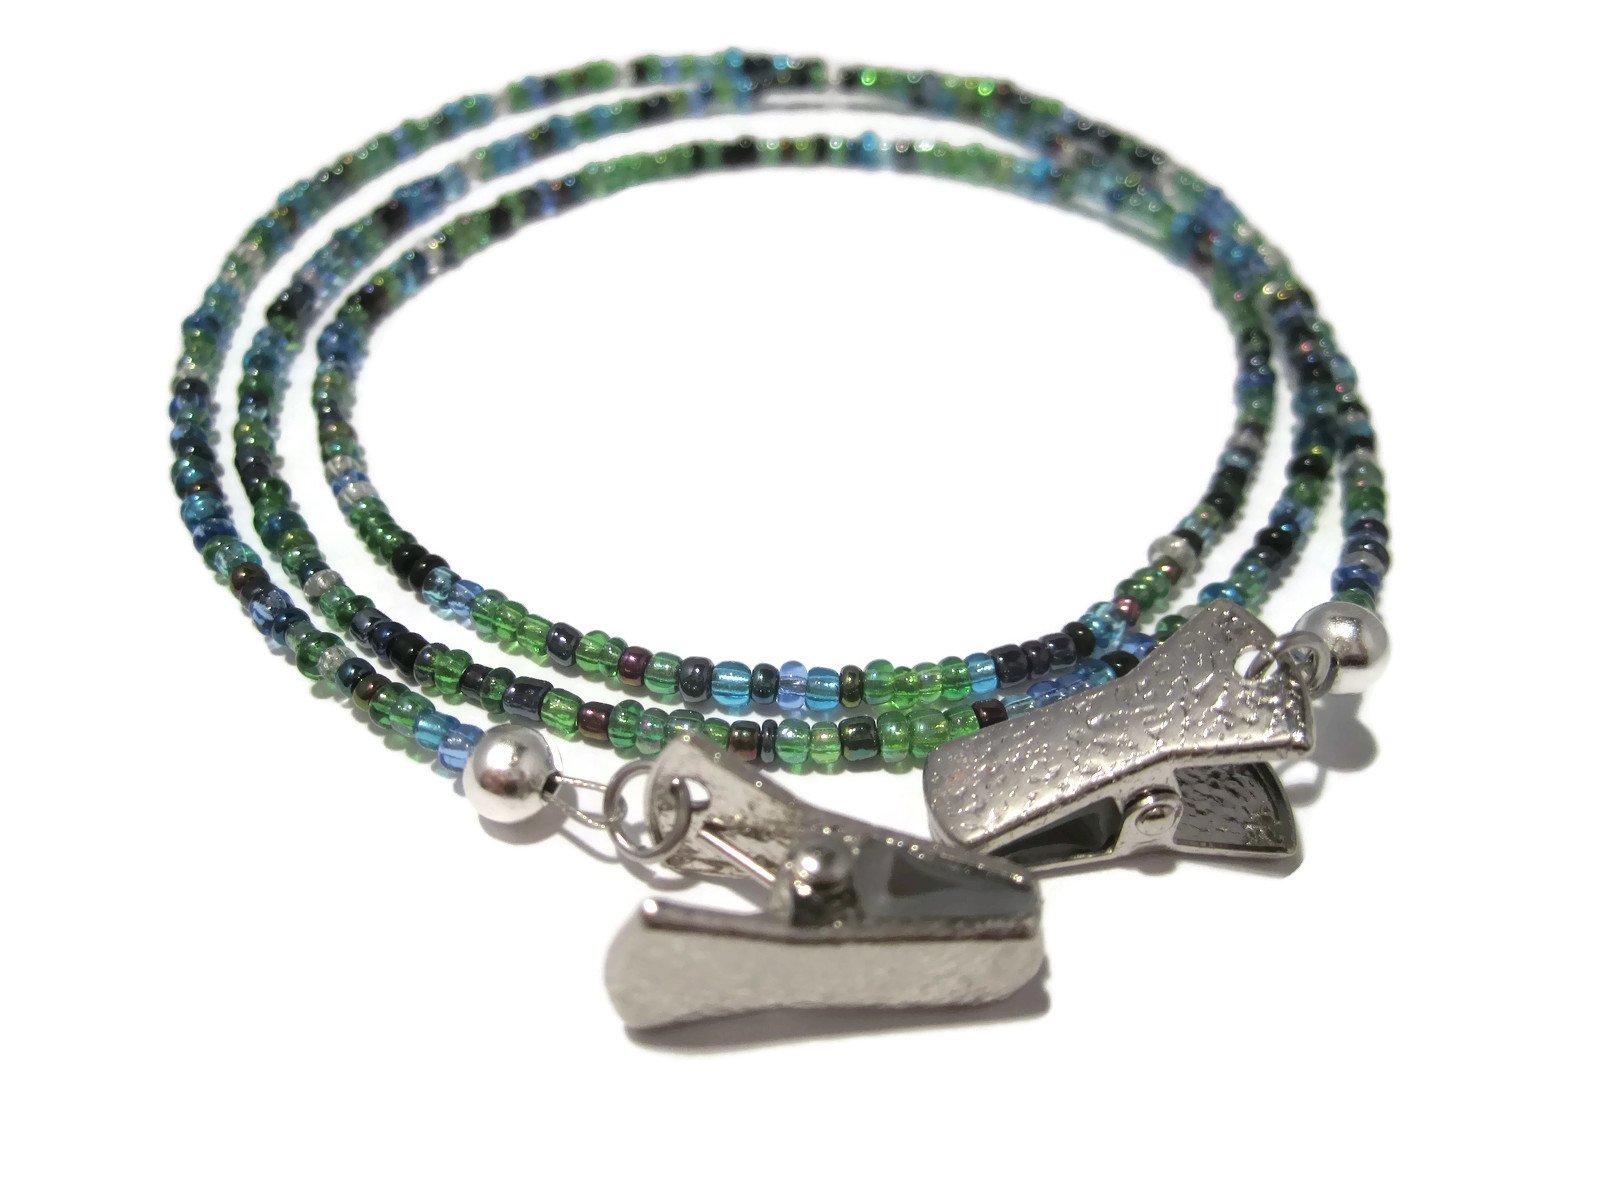 ATLanyards Peacock Clip Eyeglass Holder - Eyeglass Necklace with Silver Clips